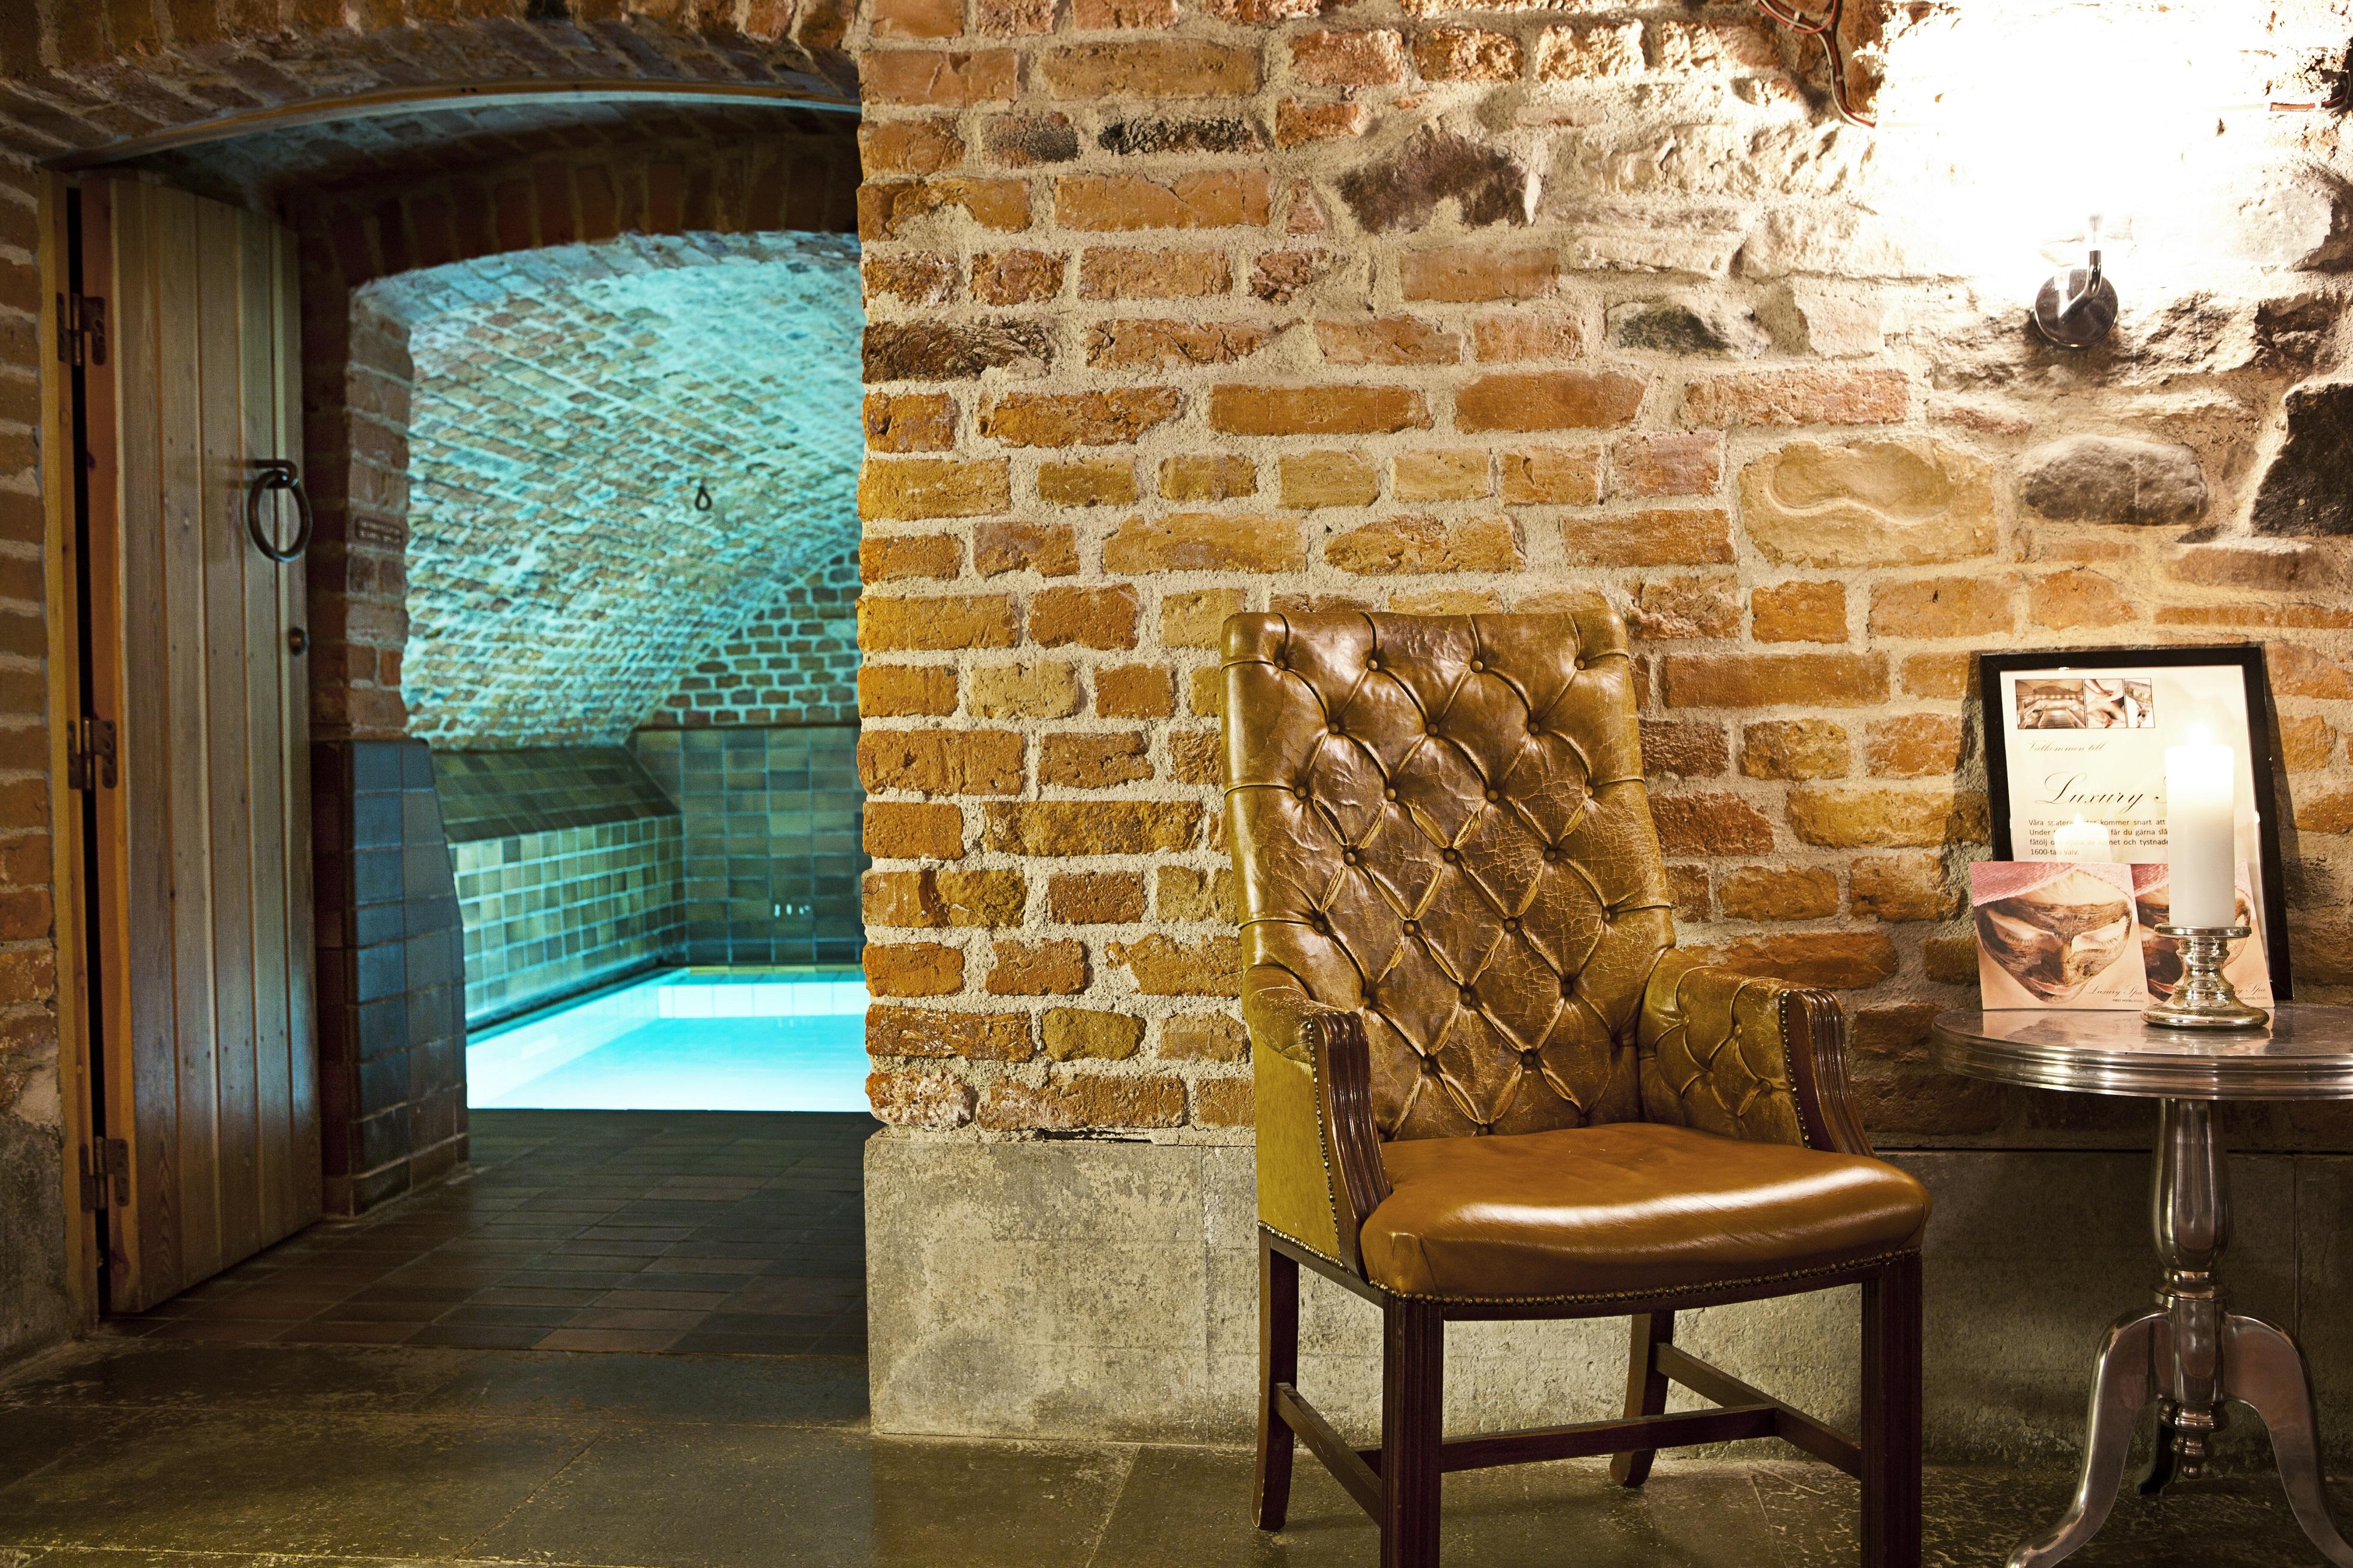 luxury spa reisen stockholm